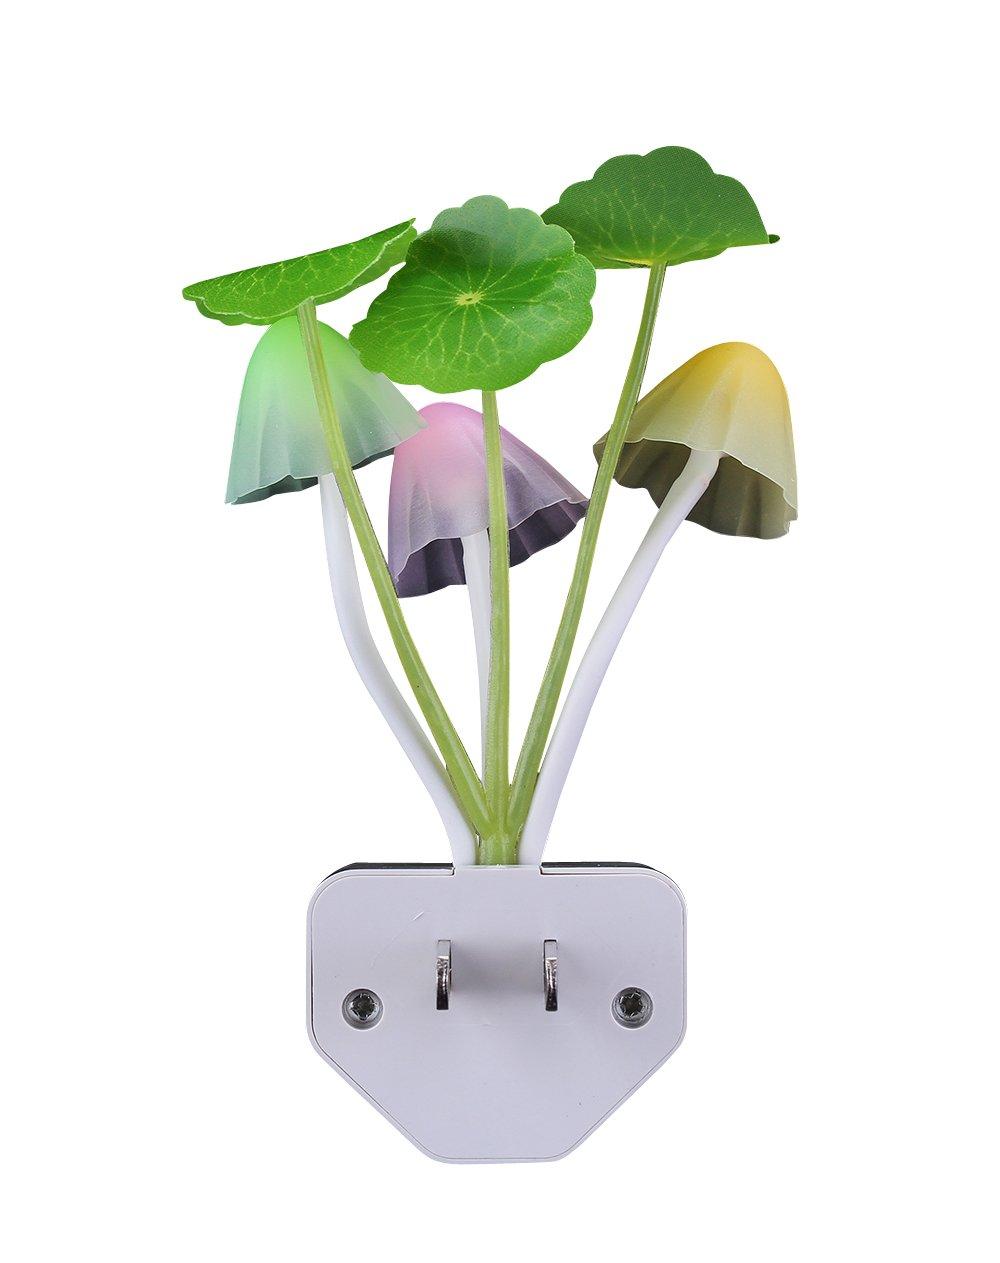 Sensor Led Night Light, Color Changing Plug-in LED Mushroom Dream Bed Lamp